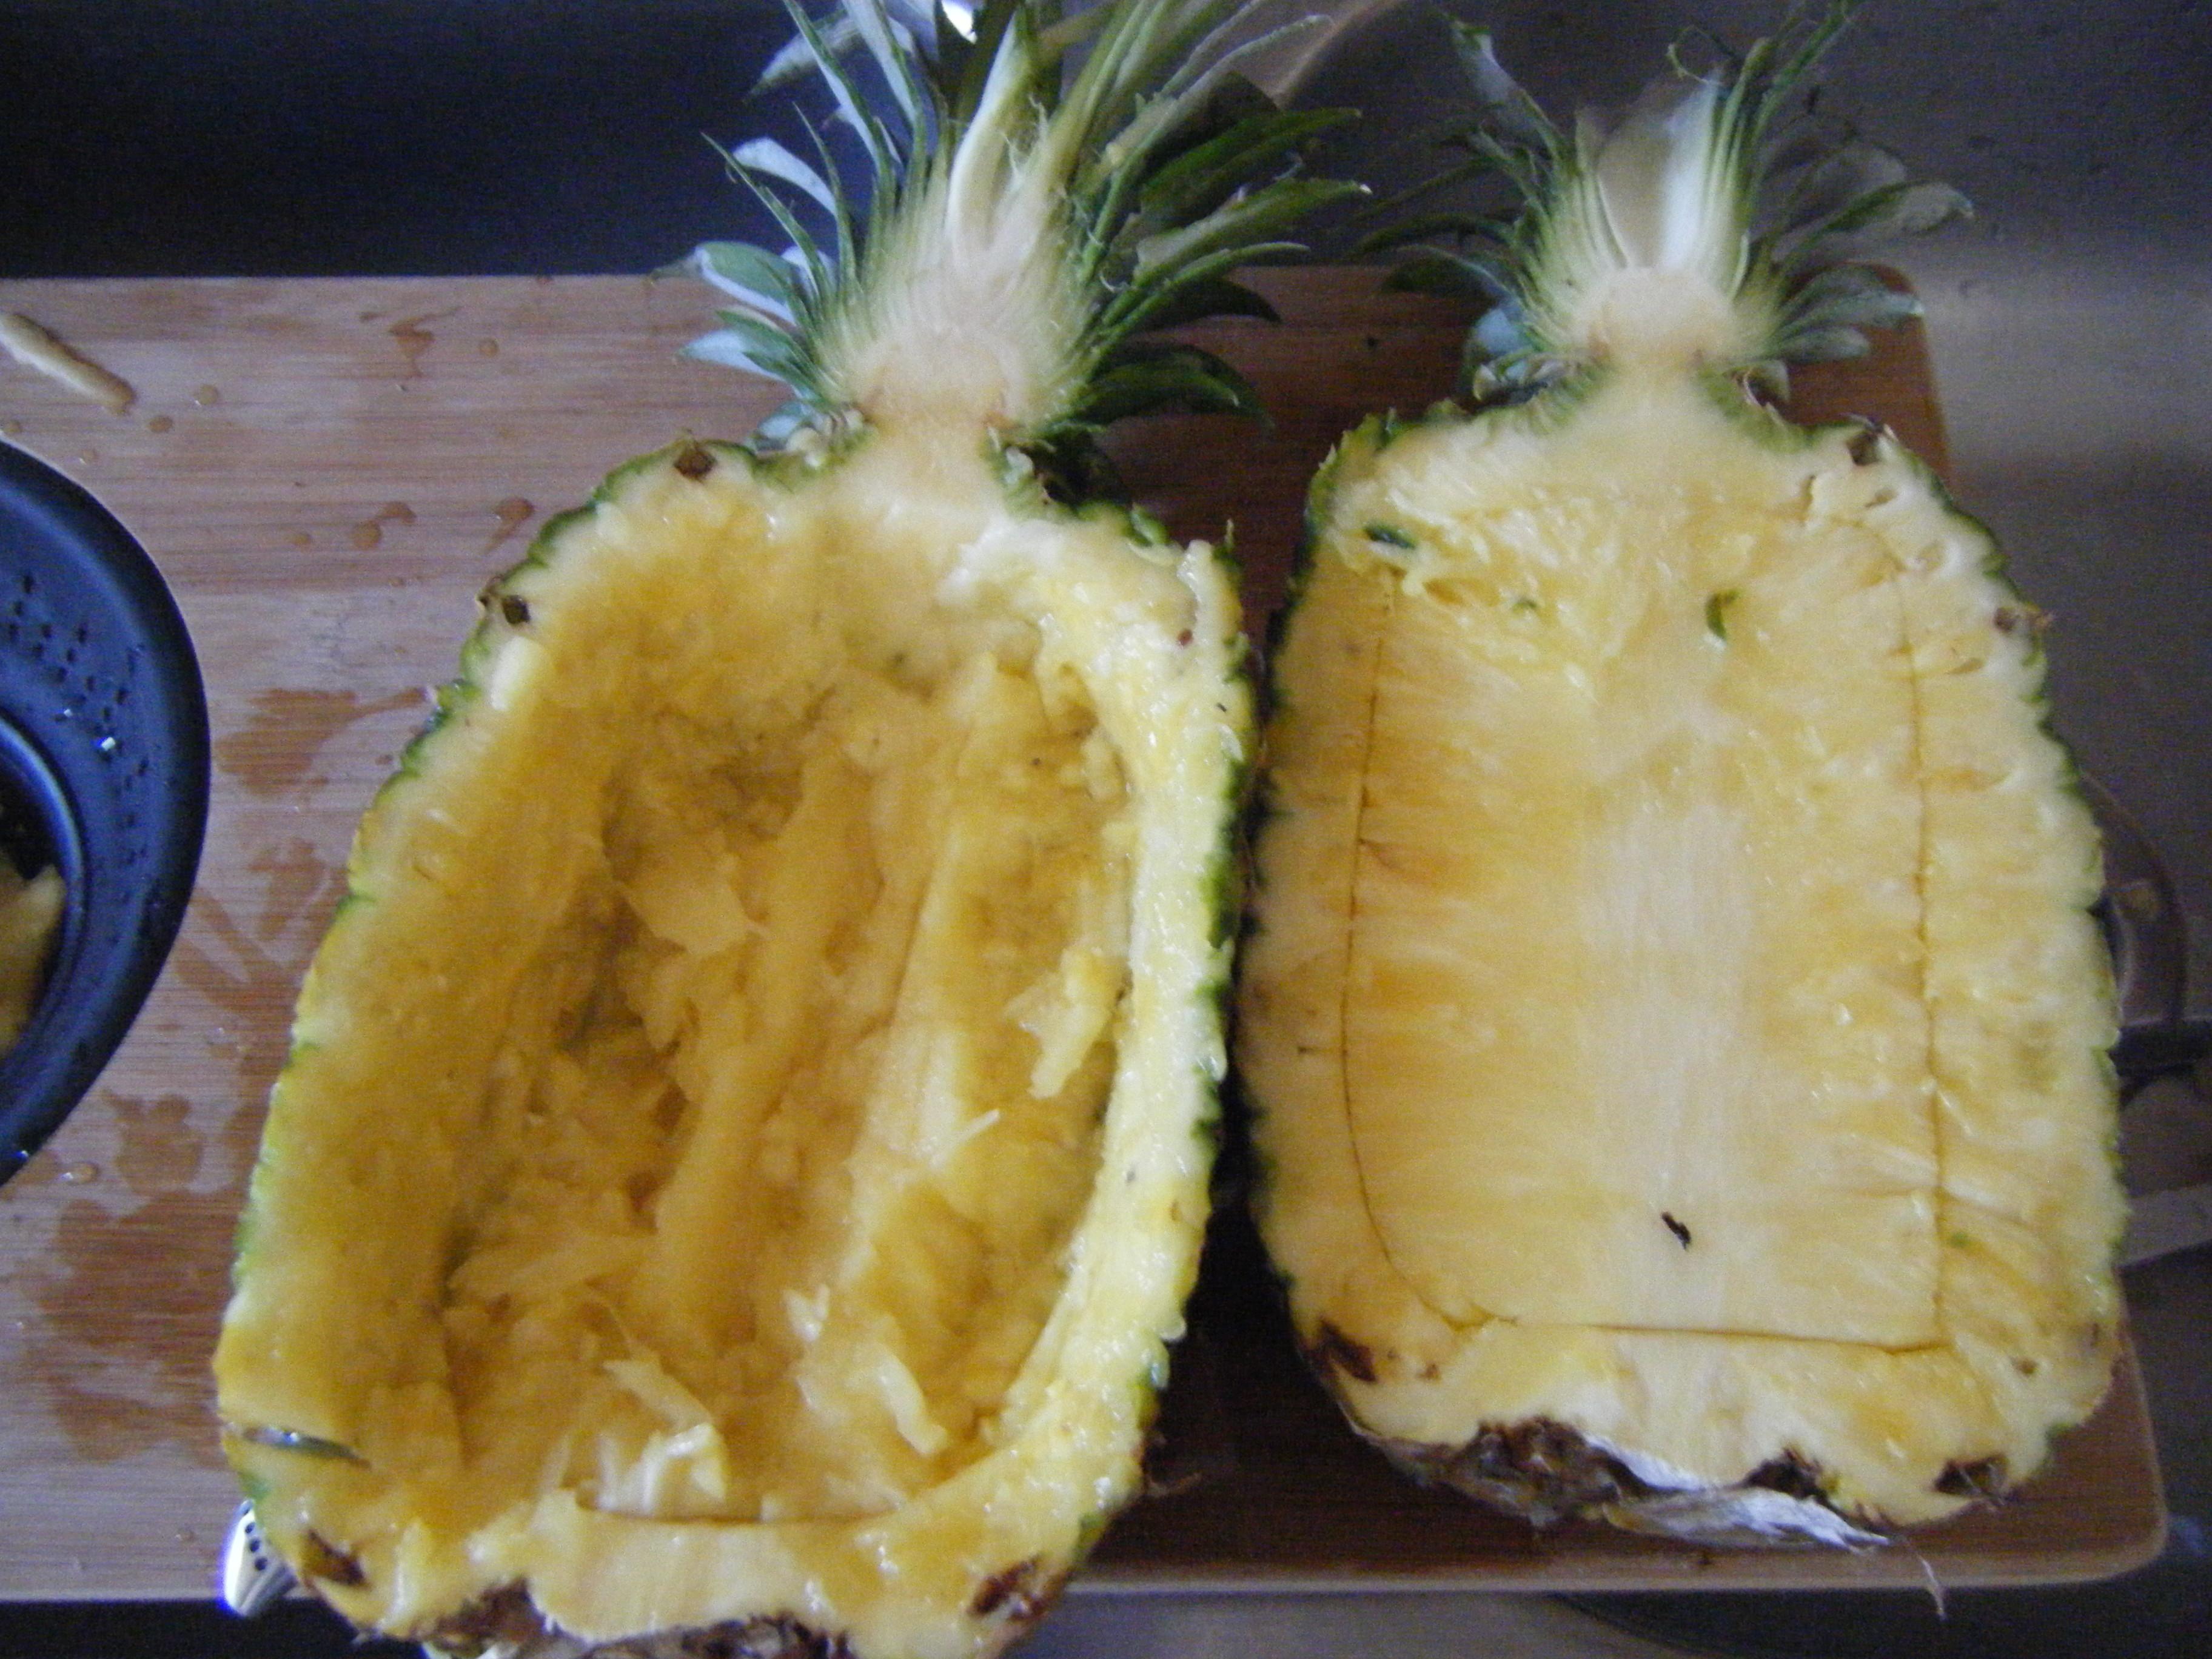 104. Pineapple Fruit Bowls | Dinner is Served 1972